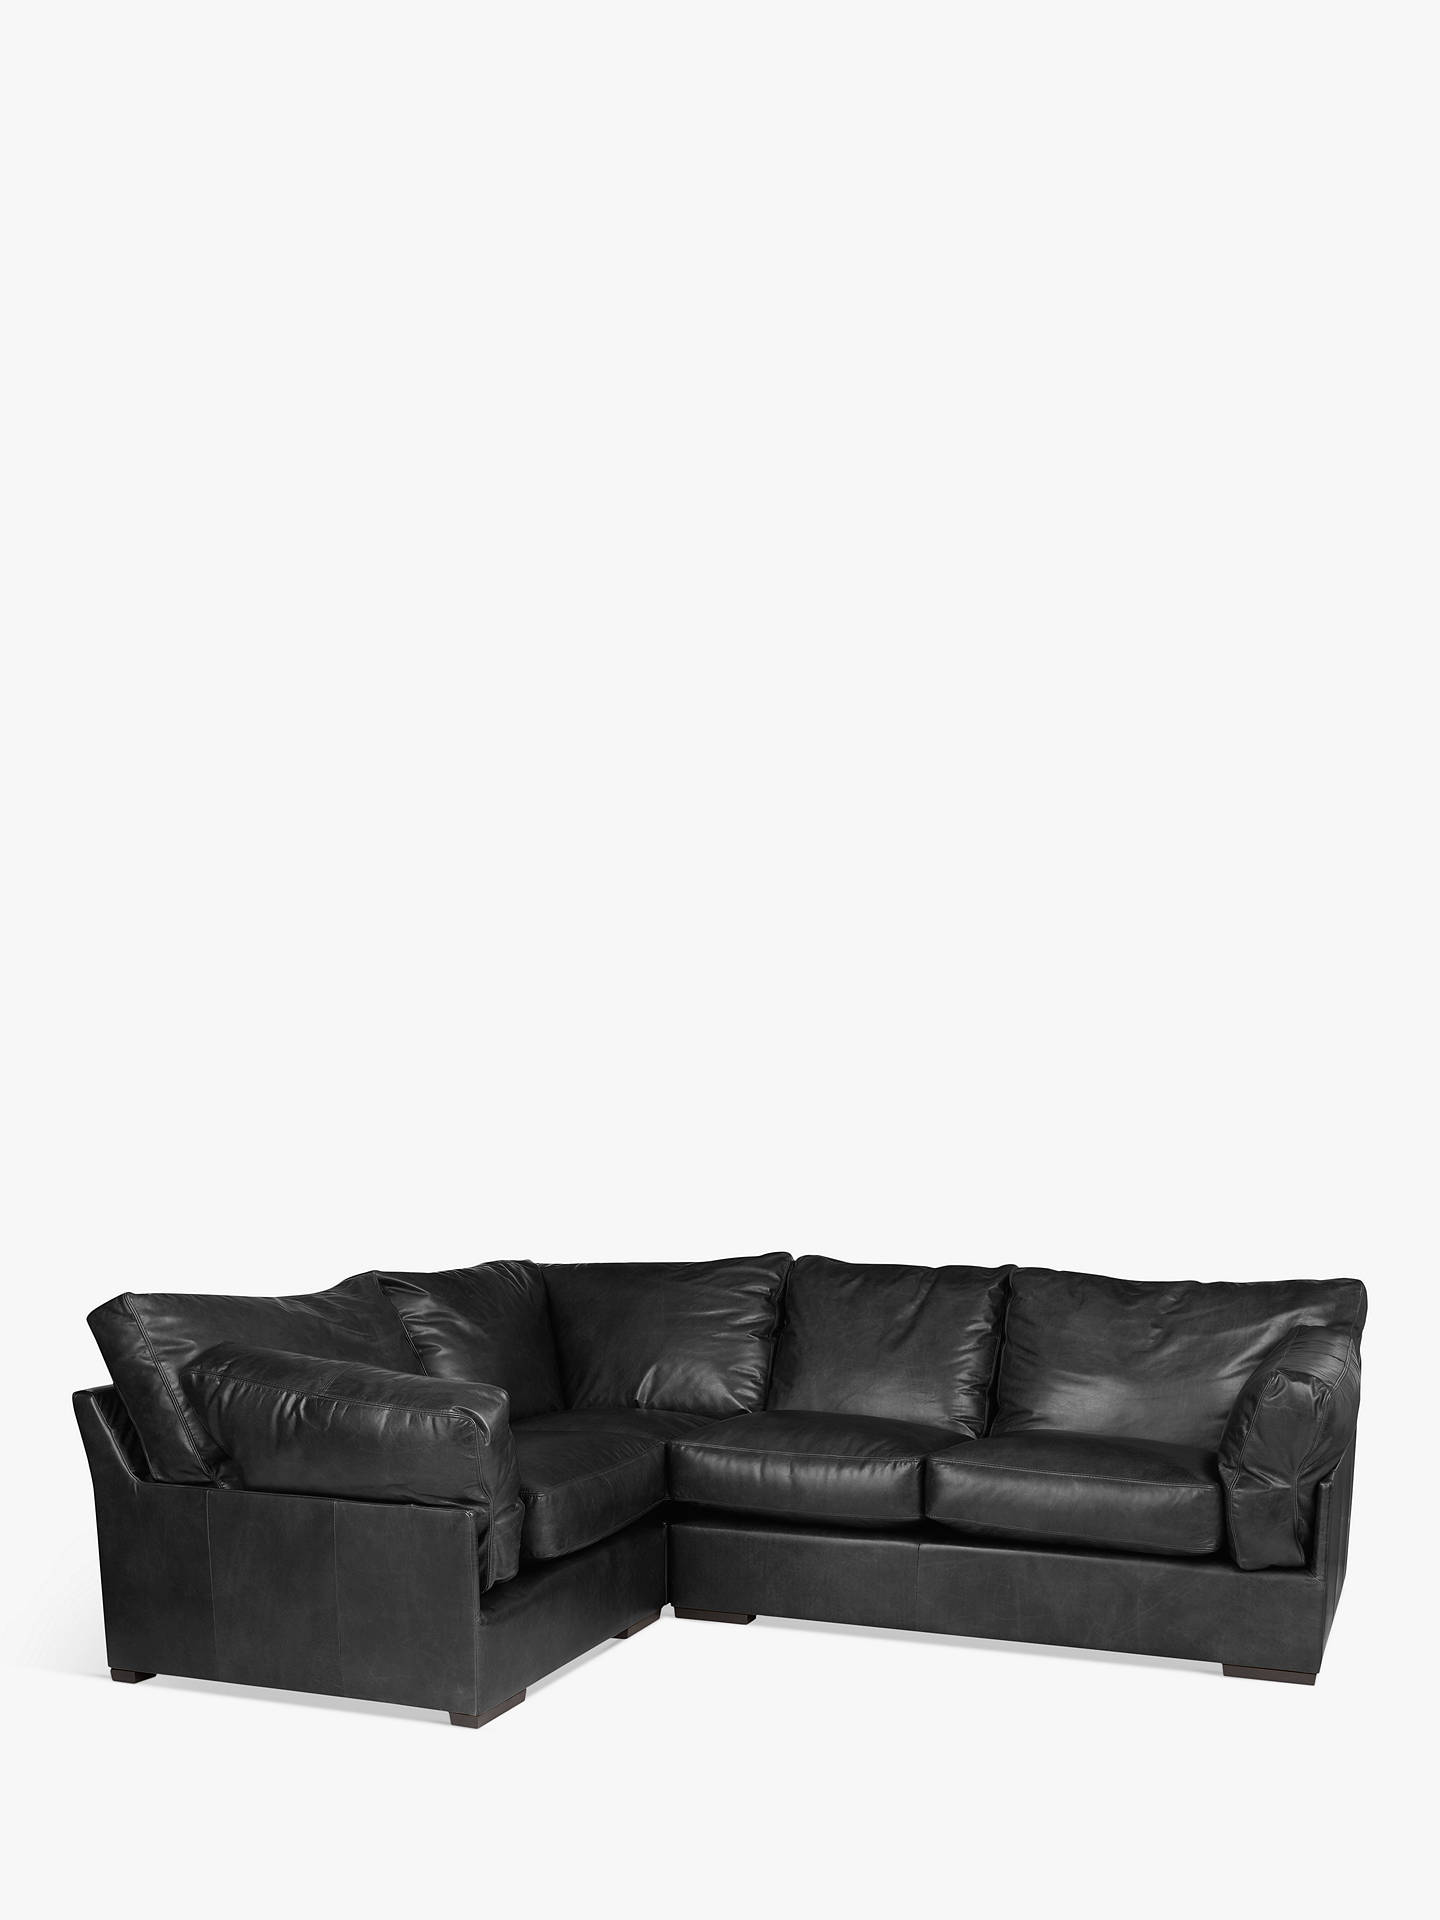 Super John Lewis Partners Java Lhf Corner Leather Sofa Dark Leg Cjindustries Chair Design For Home Cjindustriesco